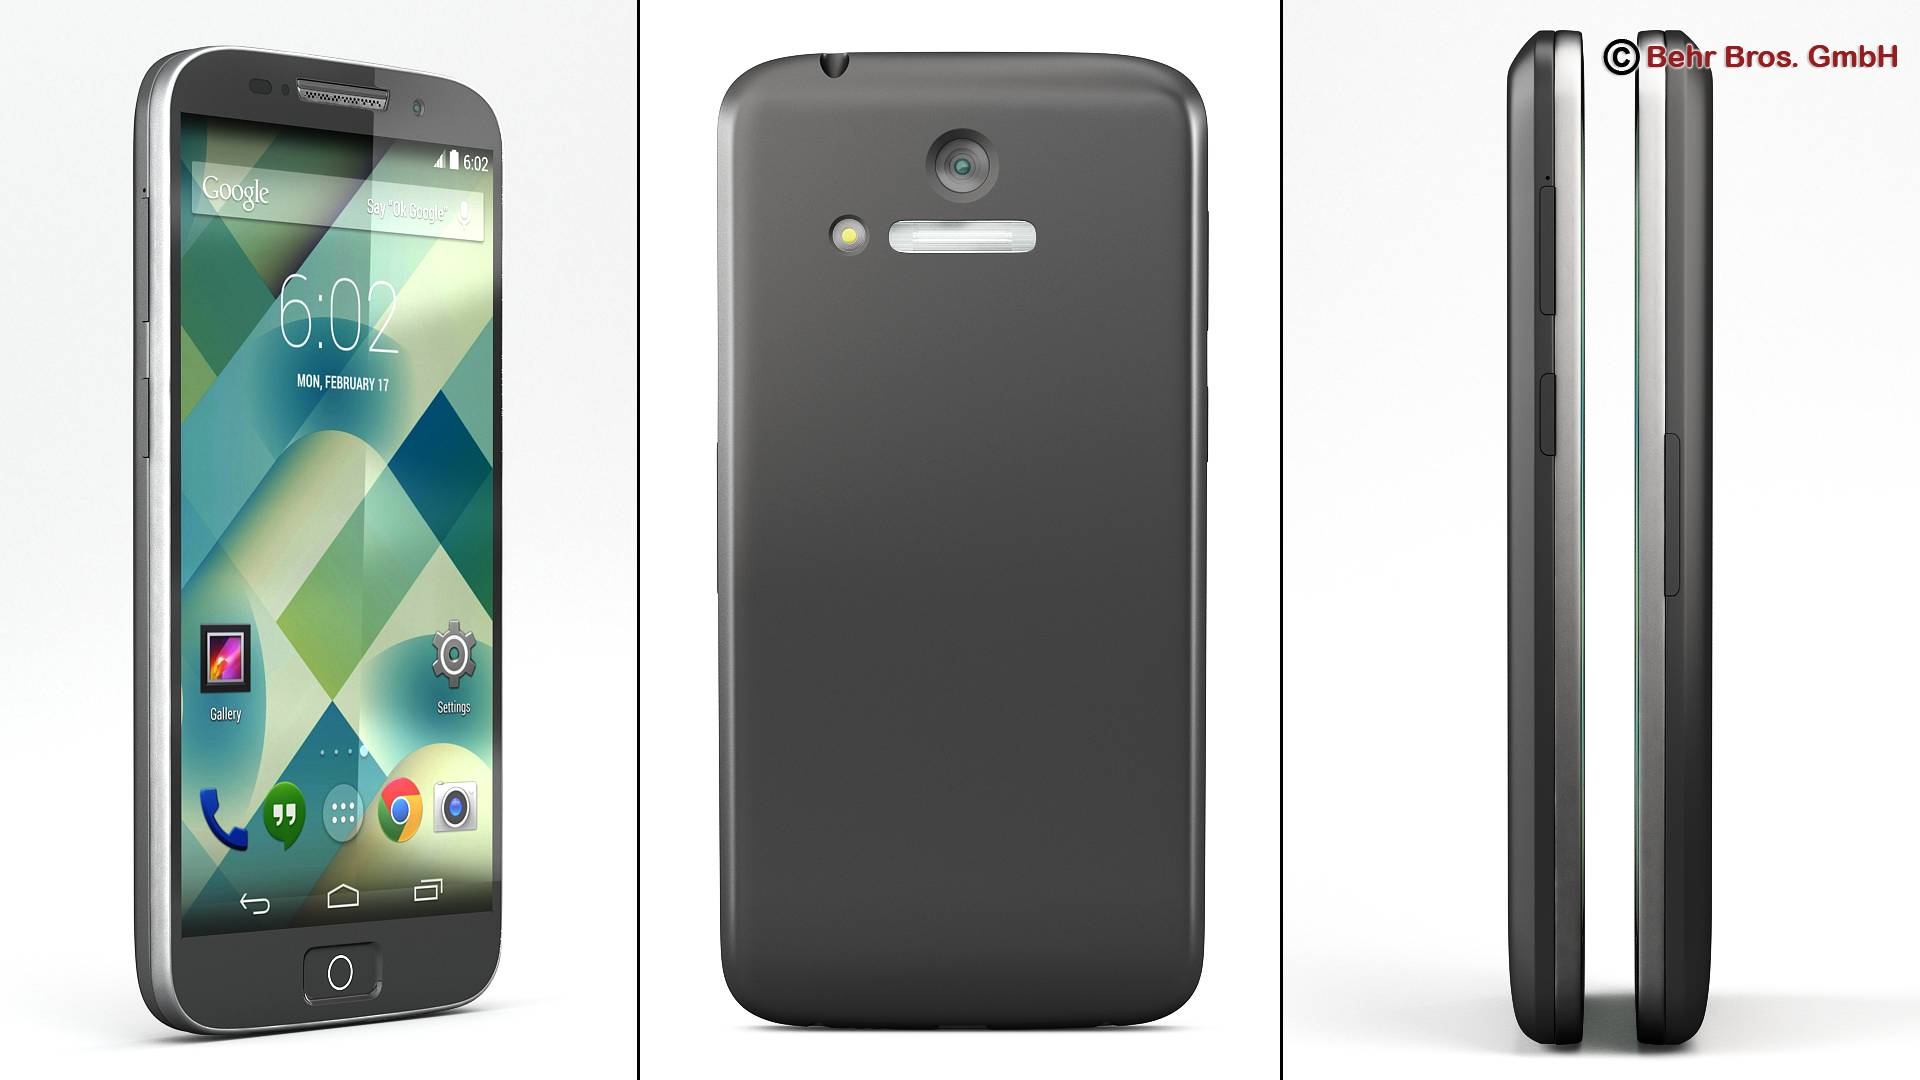 generic smartphone 4.6 inch 3d model 3ds max fbx c4d lwo ma mb obj 161635